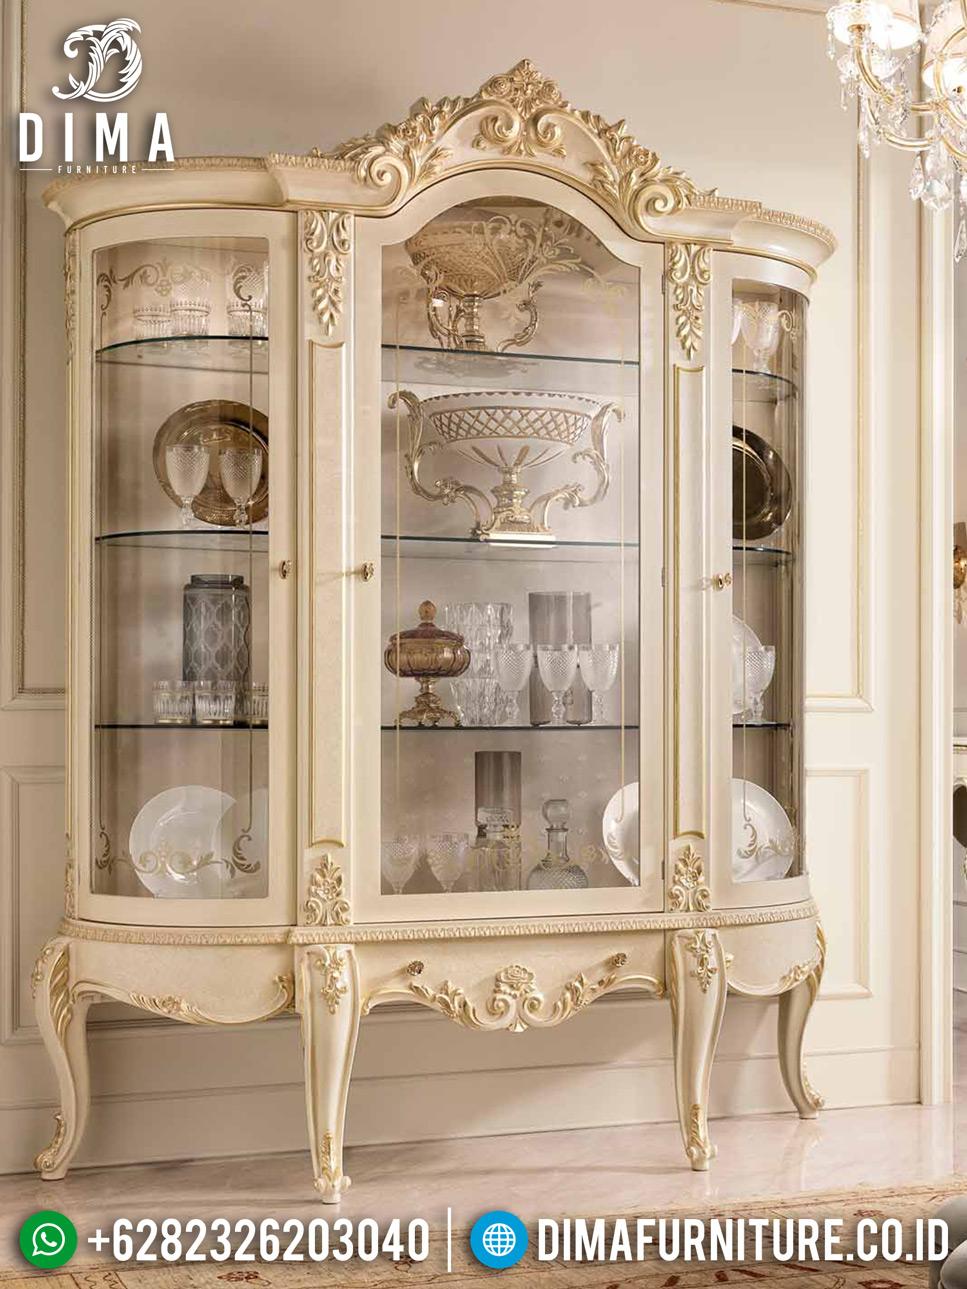 Jual Lemari Hias Ukiran Jepara New Luxury Carving Royals Elegant Style MMJ-0752